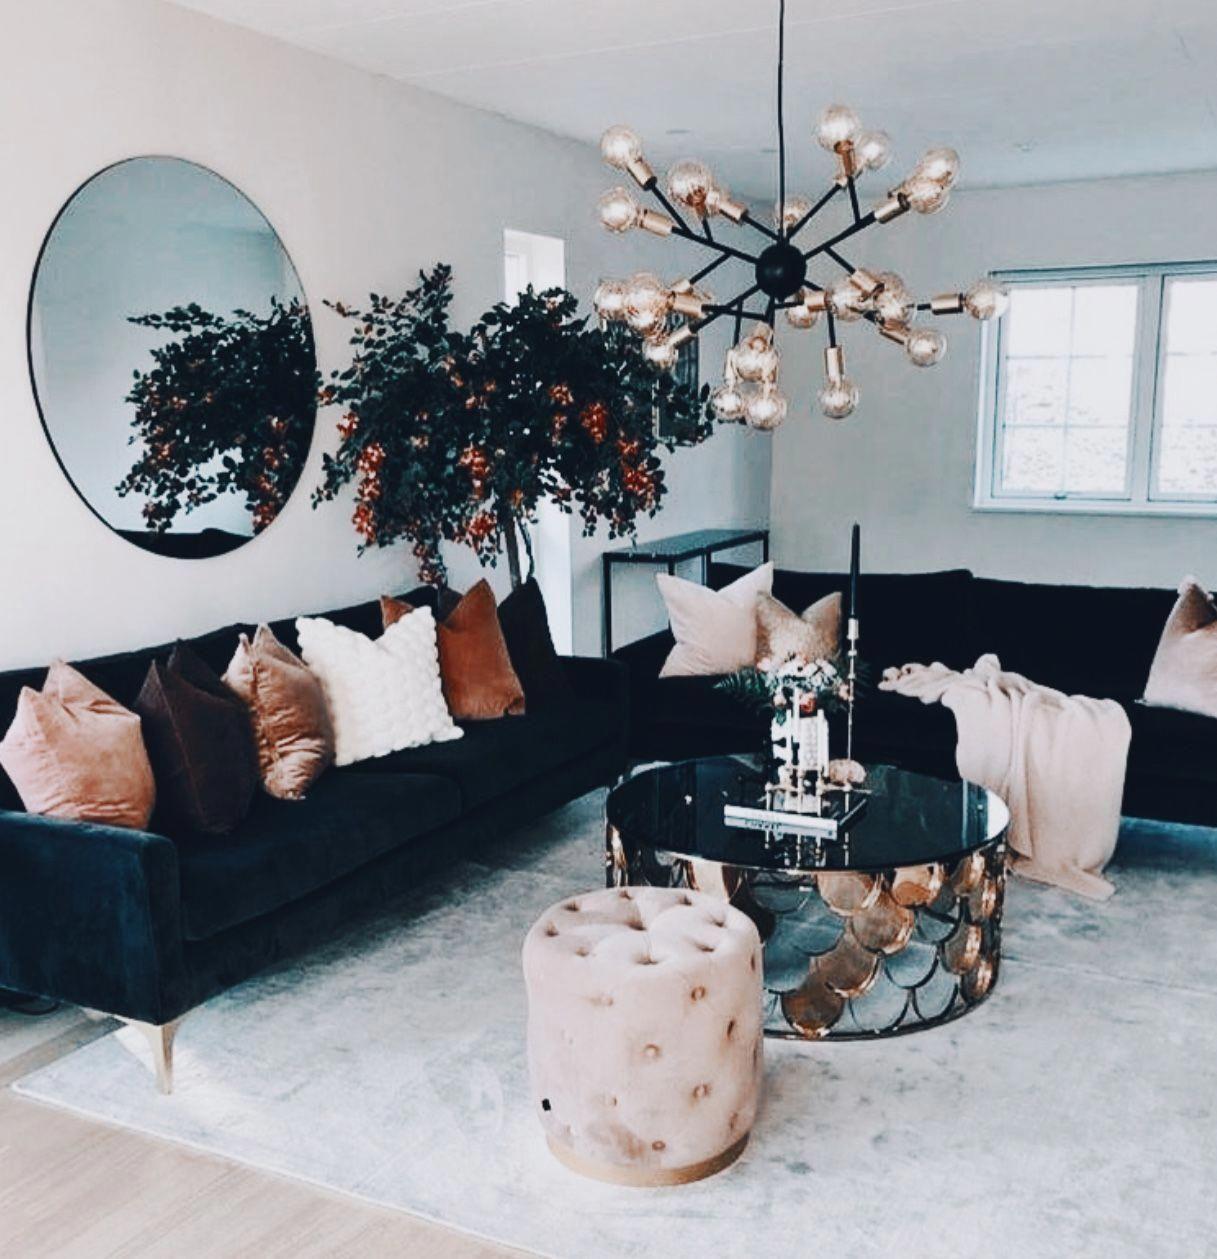 Living room decor ideas, home decor, interior design, interiors #MyDIYHomeDecorLivingRoomtips